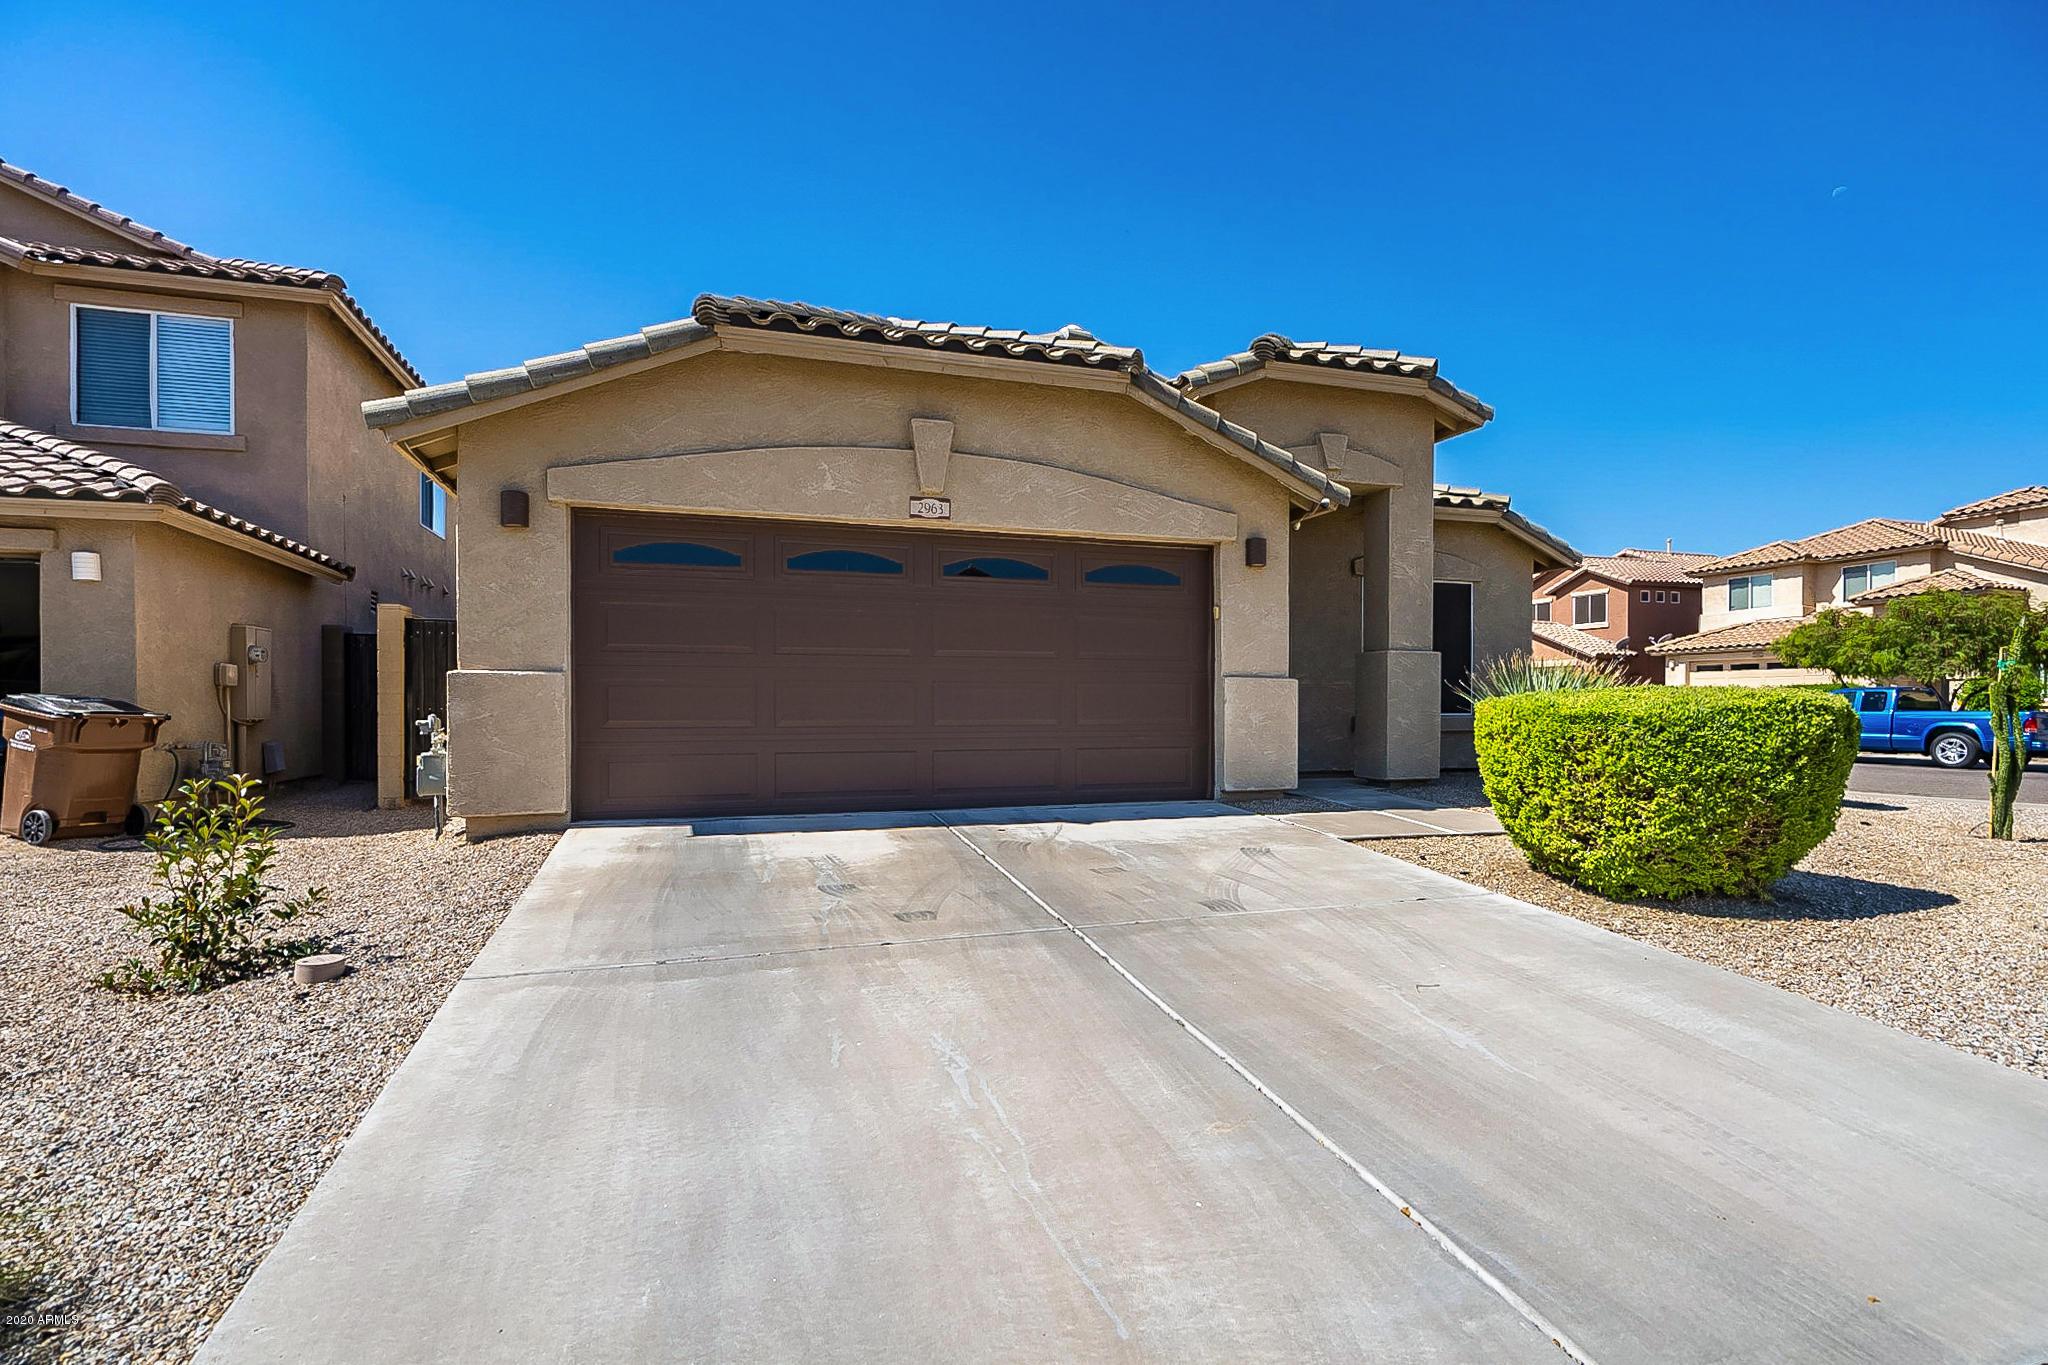 Photo of 2963 W Peggy Drive, Queen Creek, AZ 85142